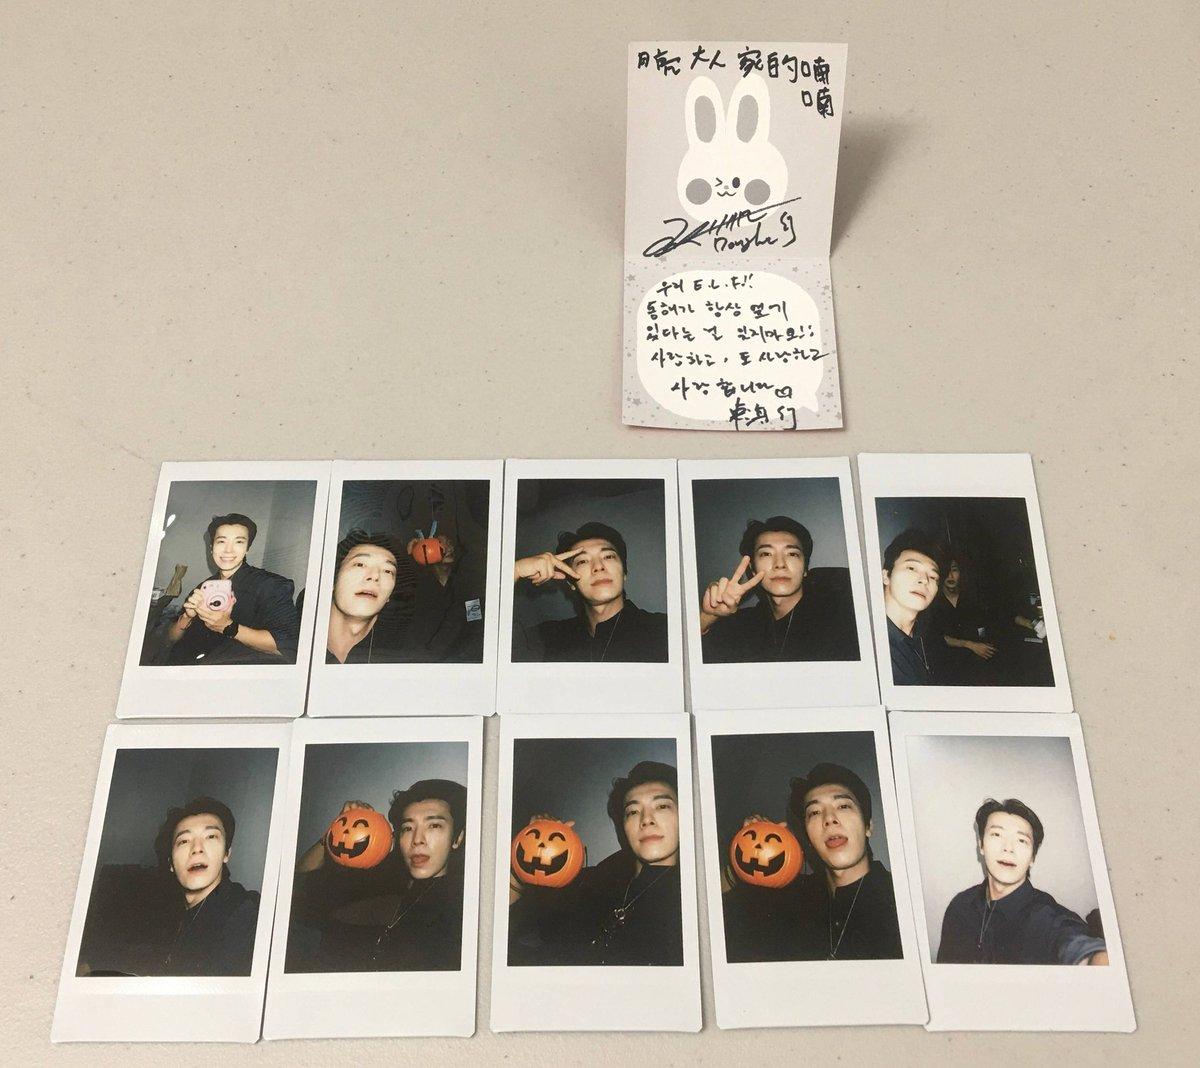 Today's Polaroid cr: 超级偶像联赛 https://t.co/qehh9dEJYs